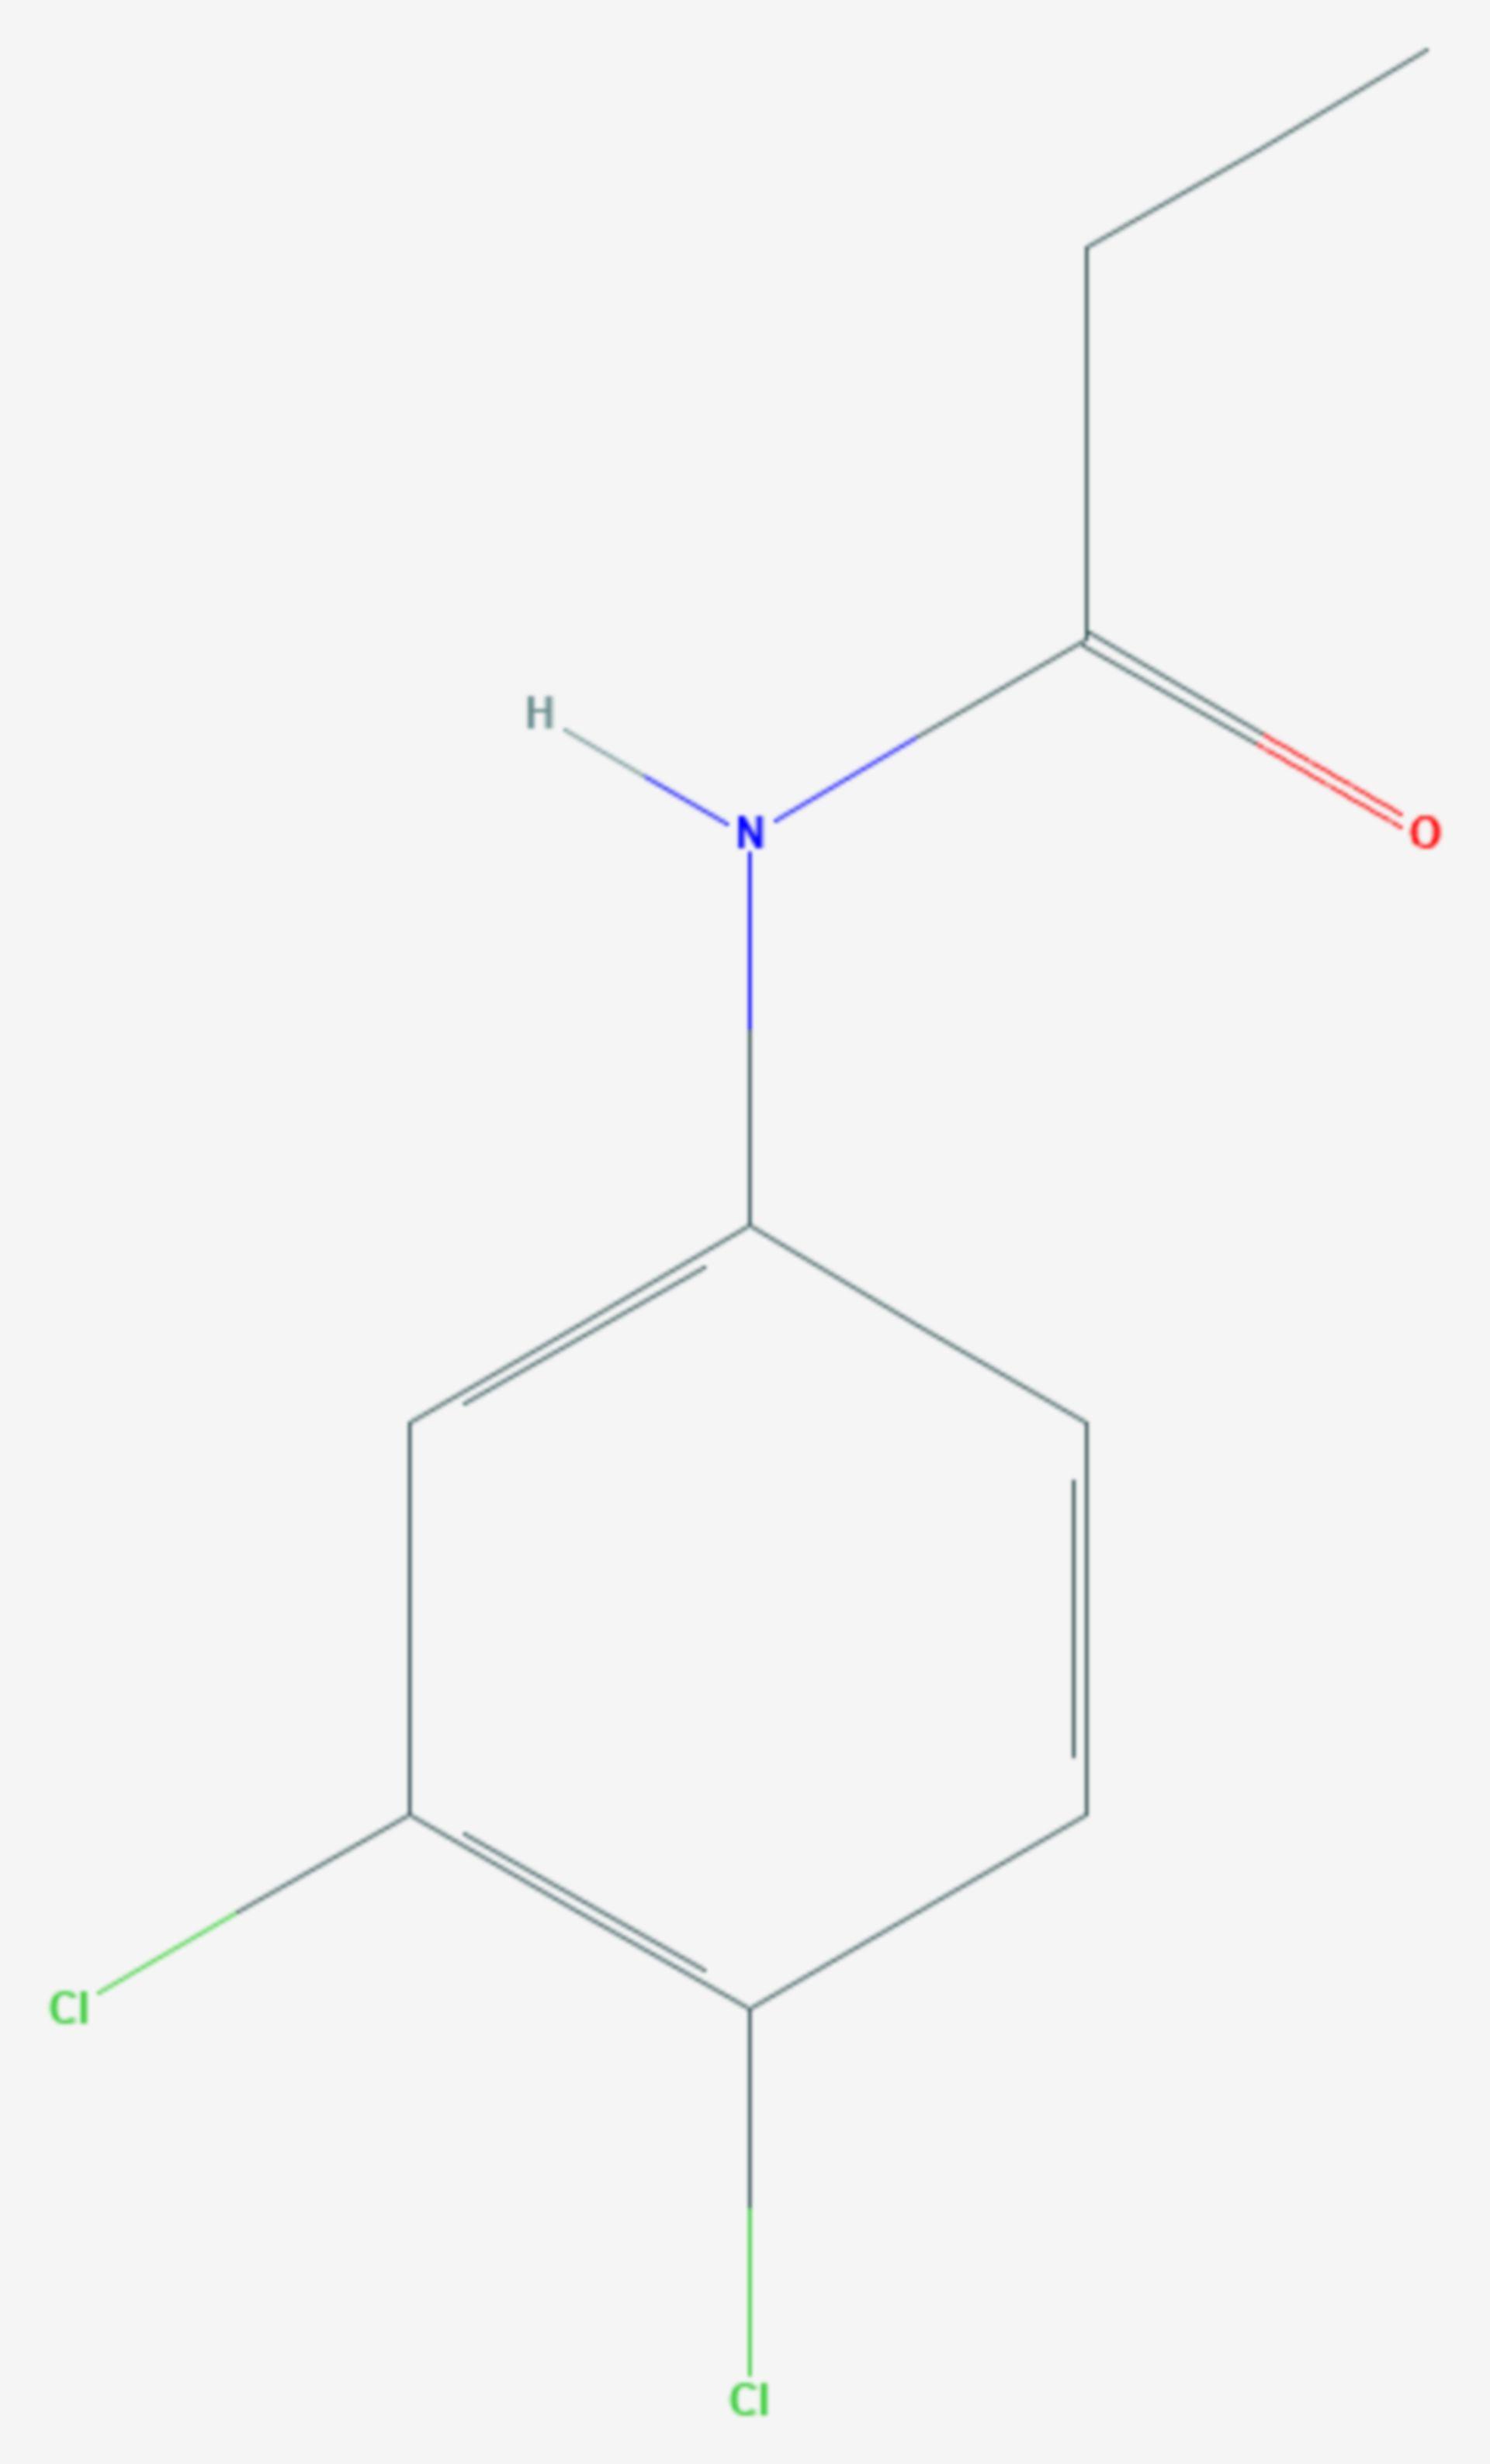 Propanil (Strukturformel)